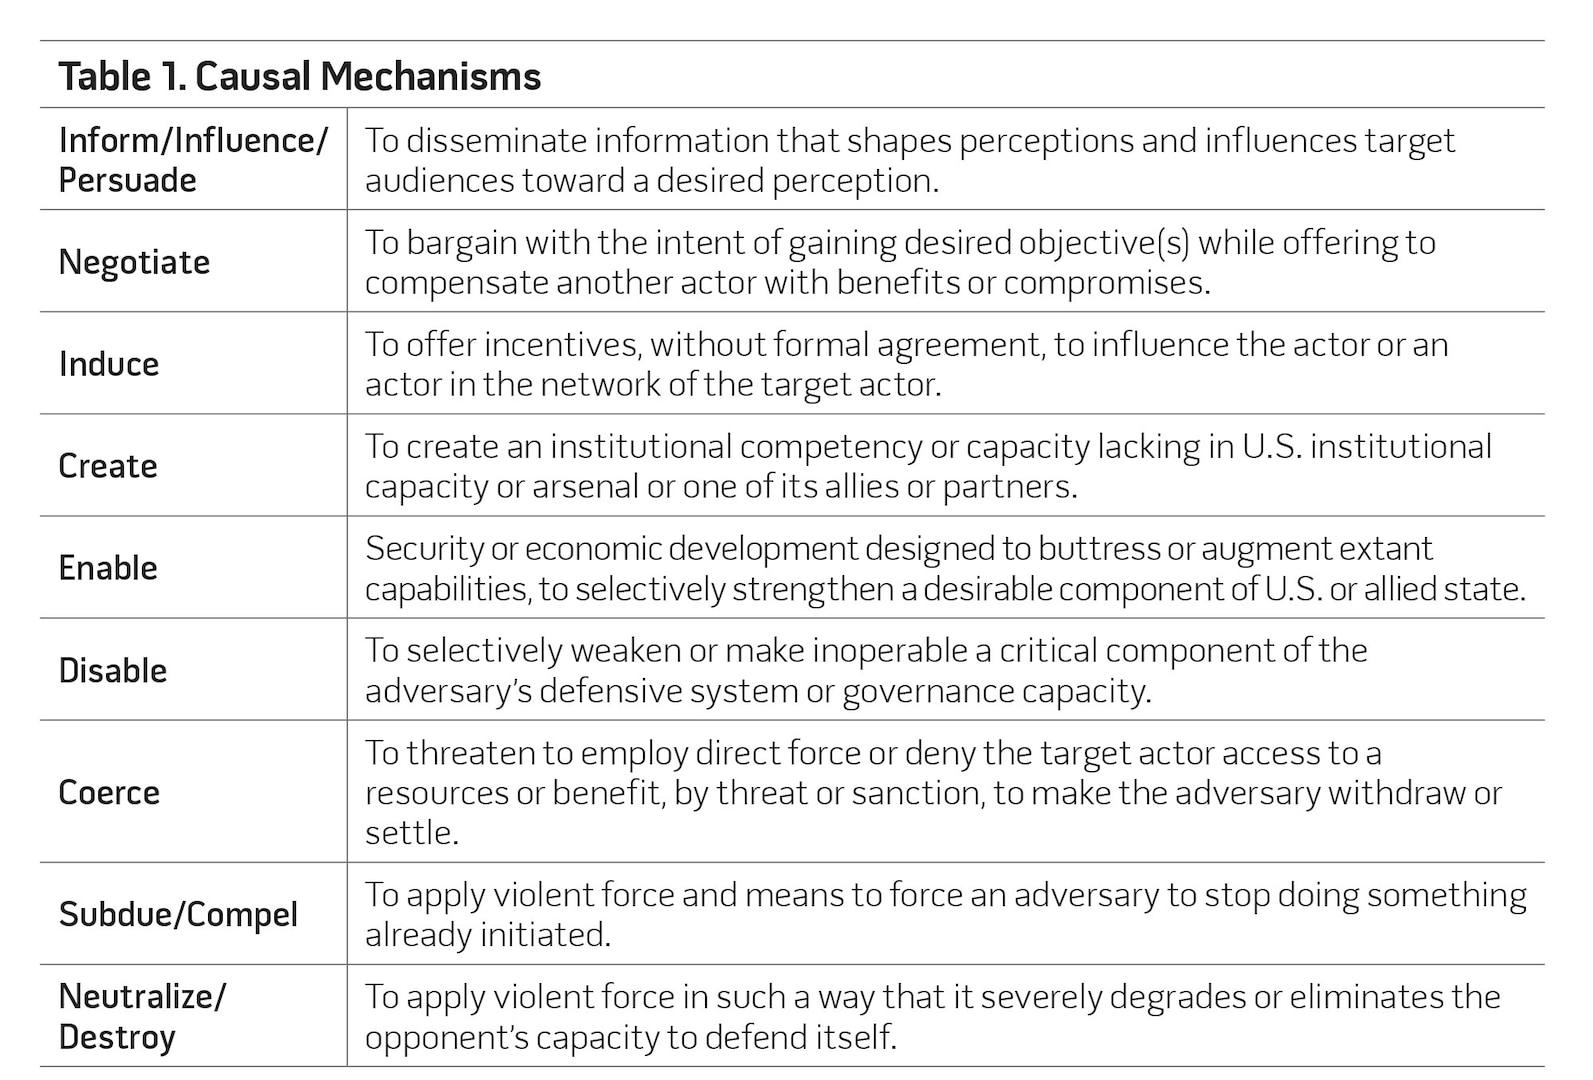 Table 1. Causal Mechanisms